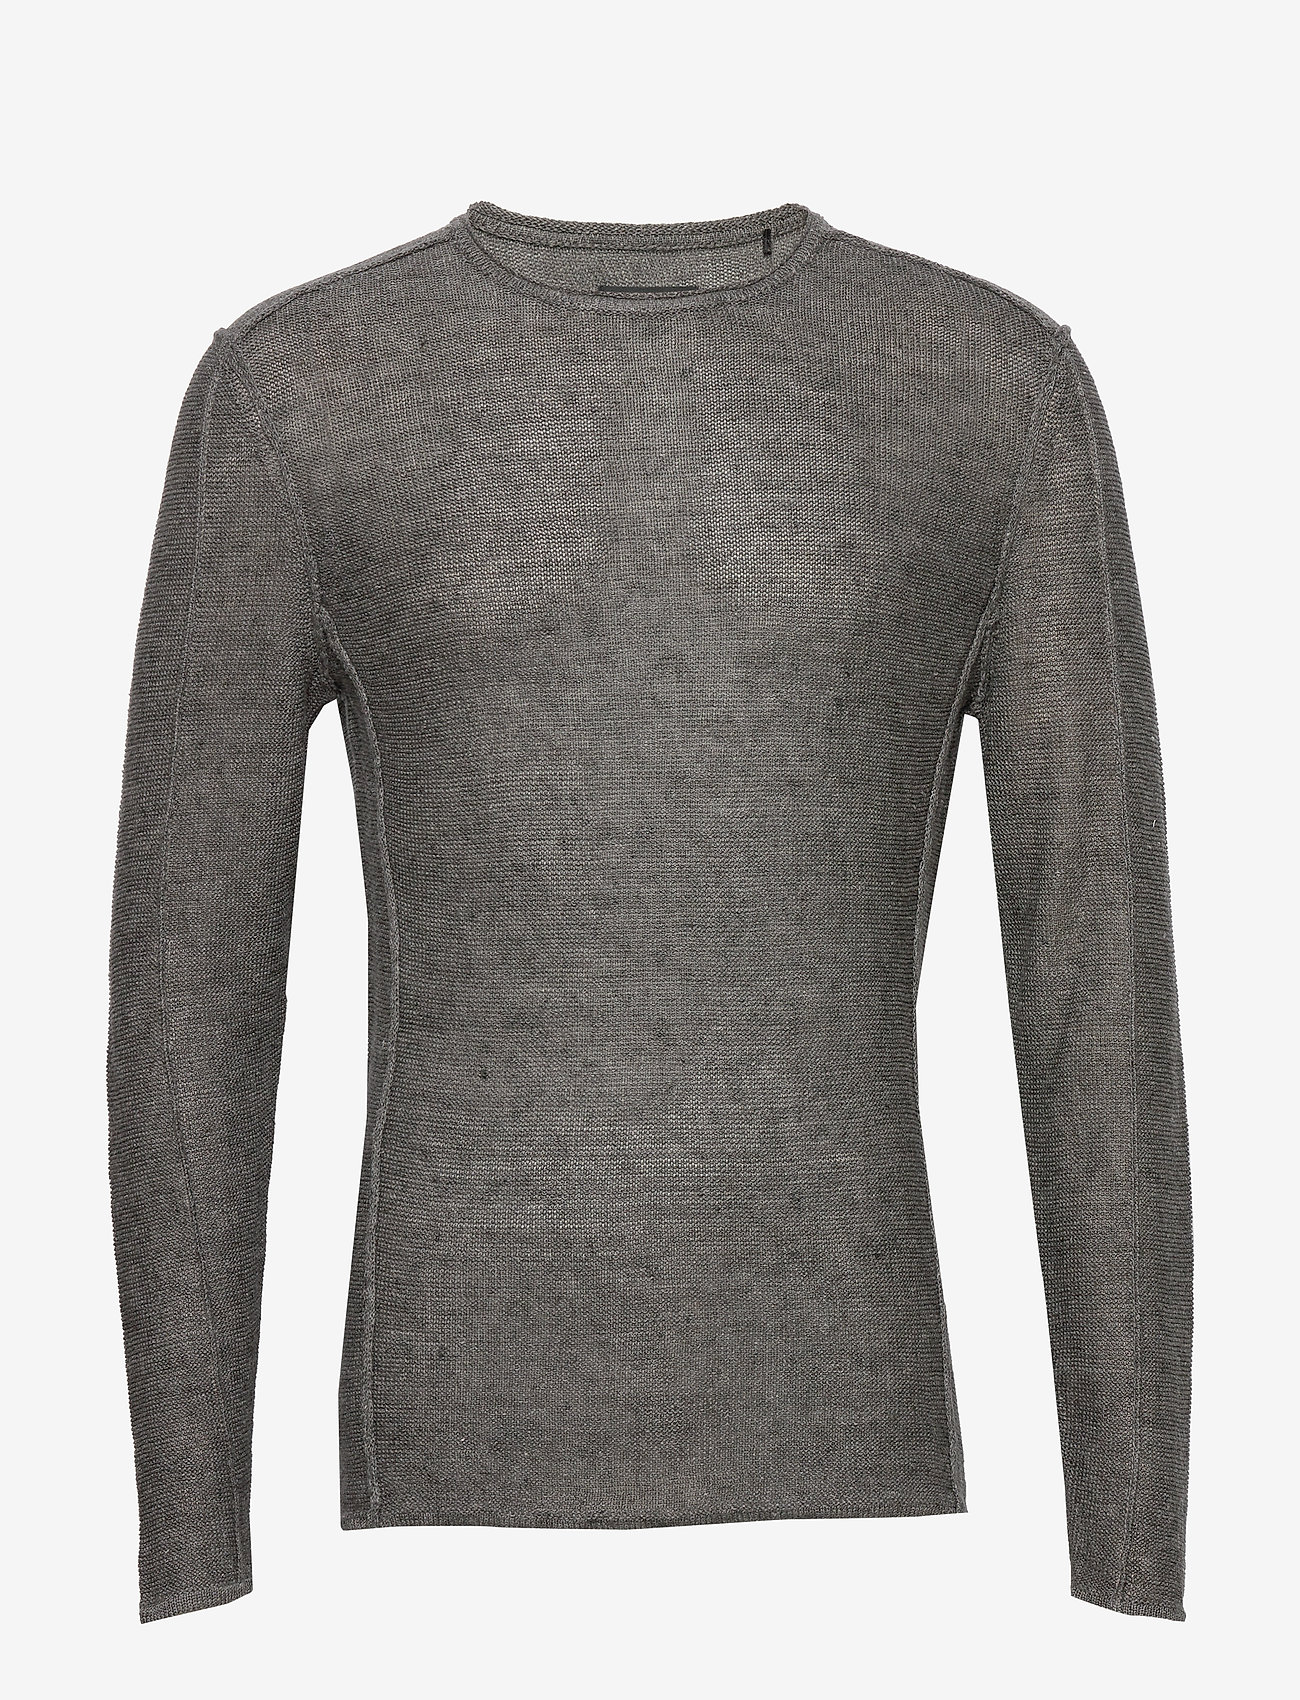 Gabba - Liam Linen Knit - basic strik - dk. grey mel - 0